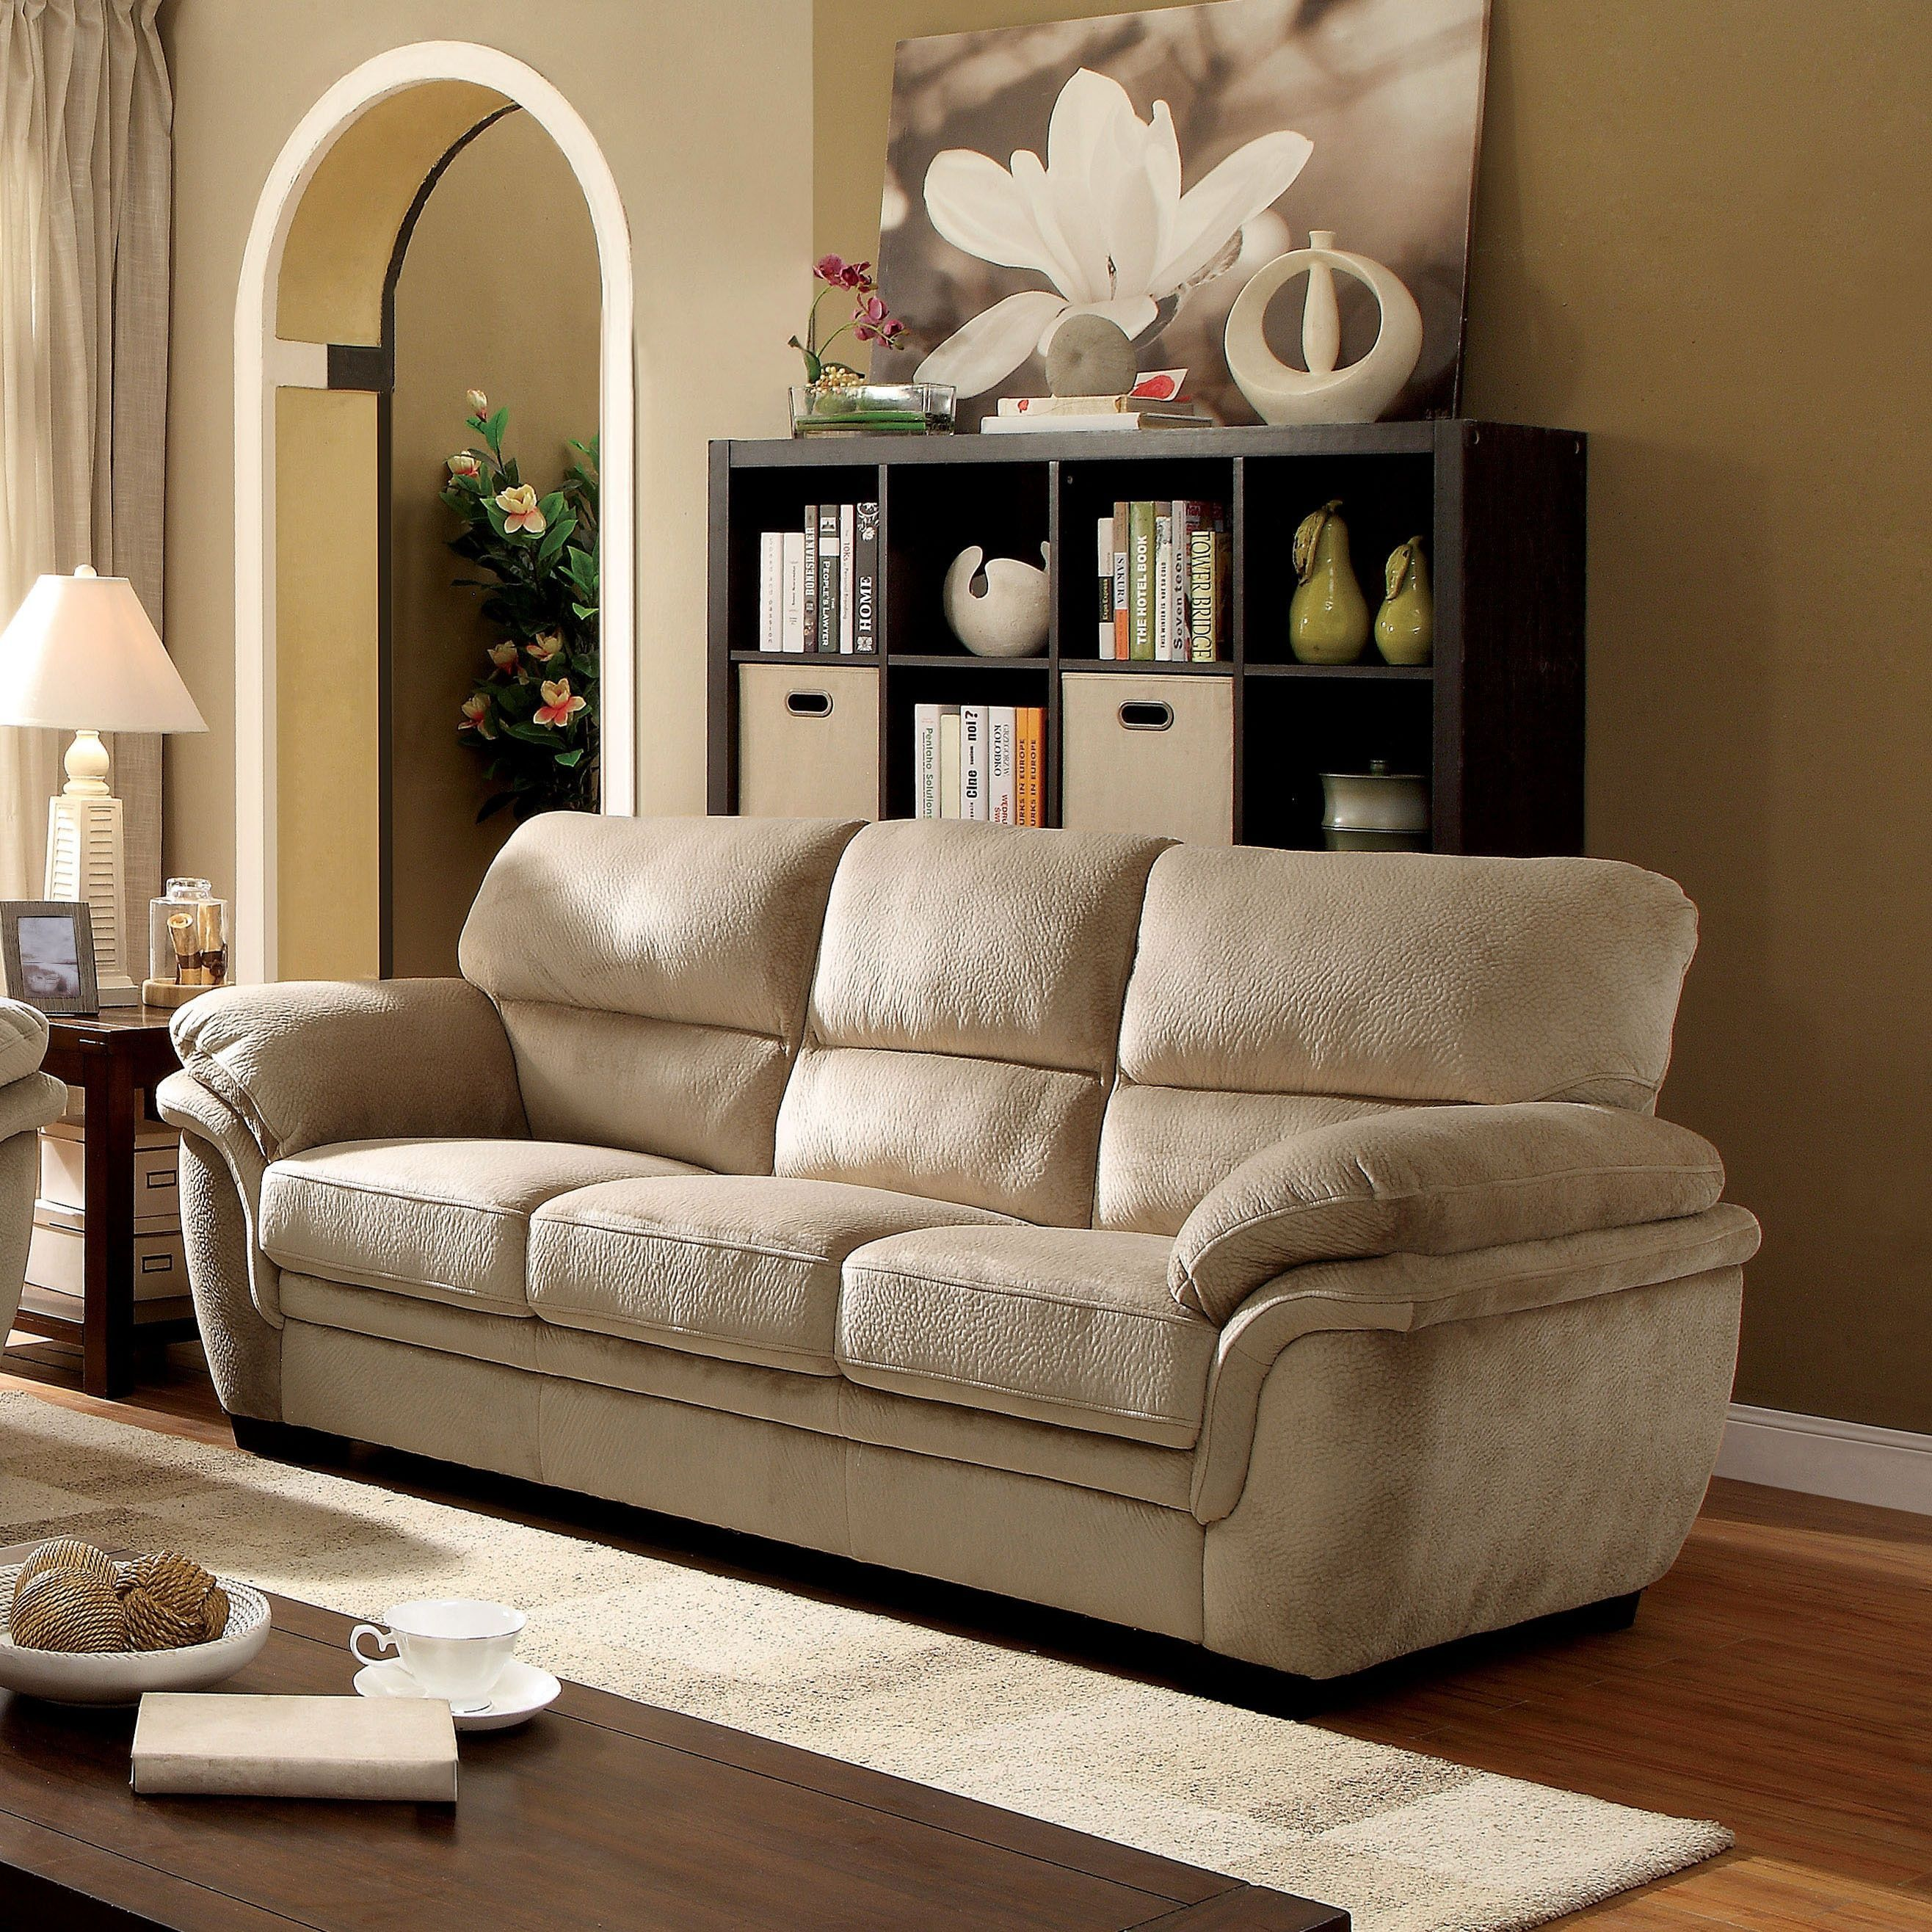 Furniture of america lemmy transitional plush microfiber sofa light brown foam